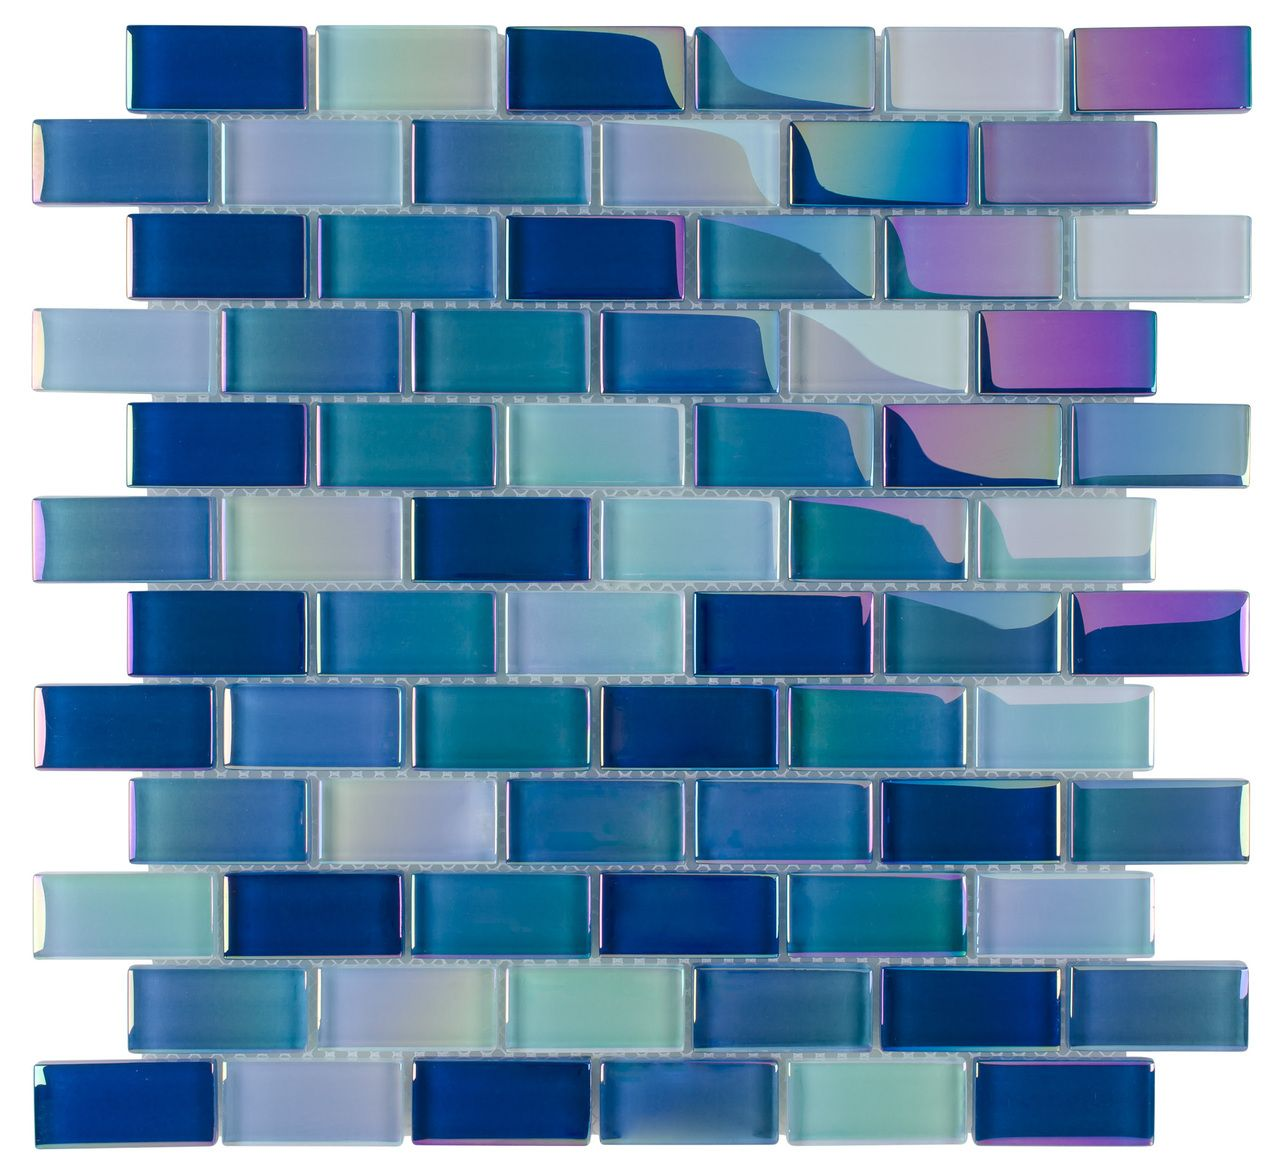 Glass Pool Tile Shimmer Aqua Blue 1x2 | Mineral Tiles $13.95 per ...